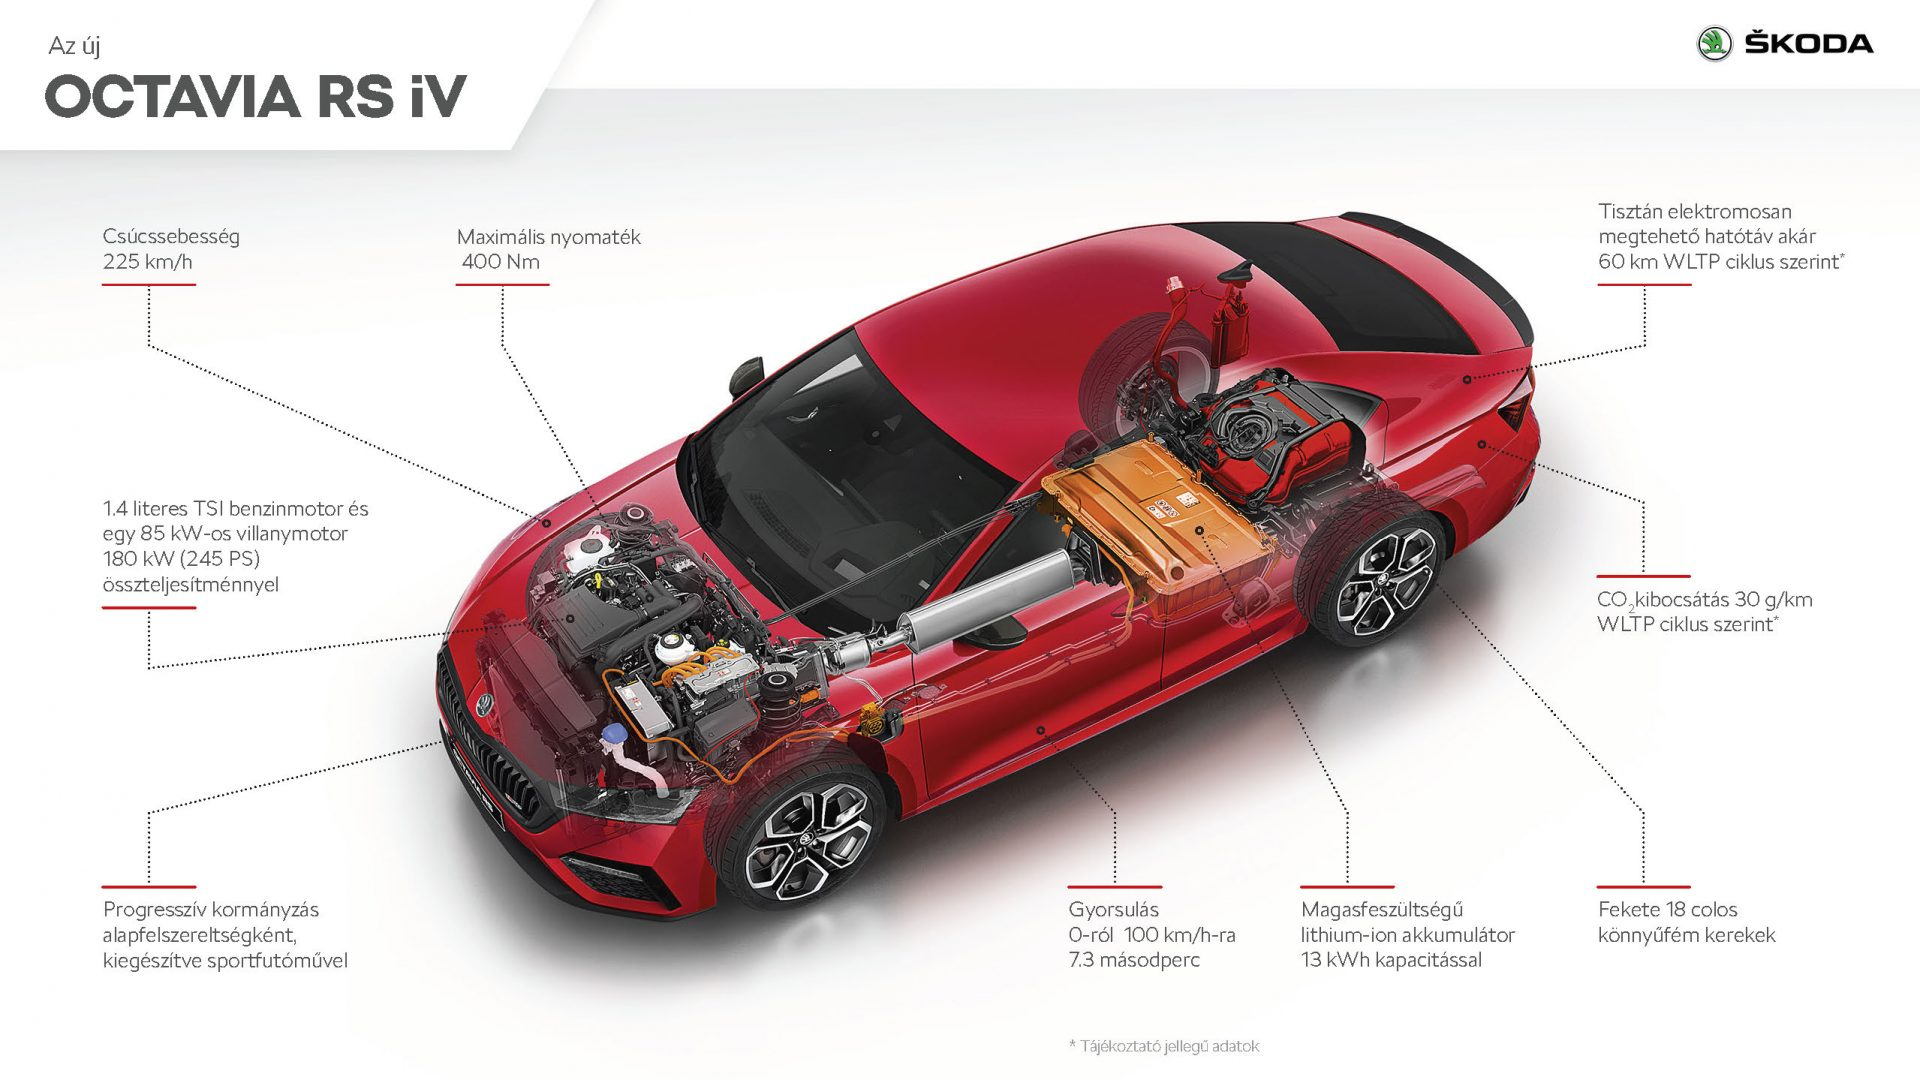 OCTAVIA RS iV 2020